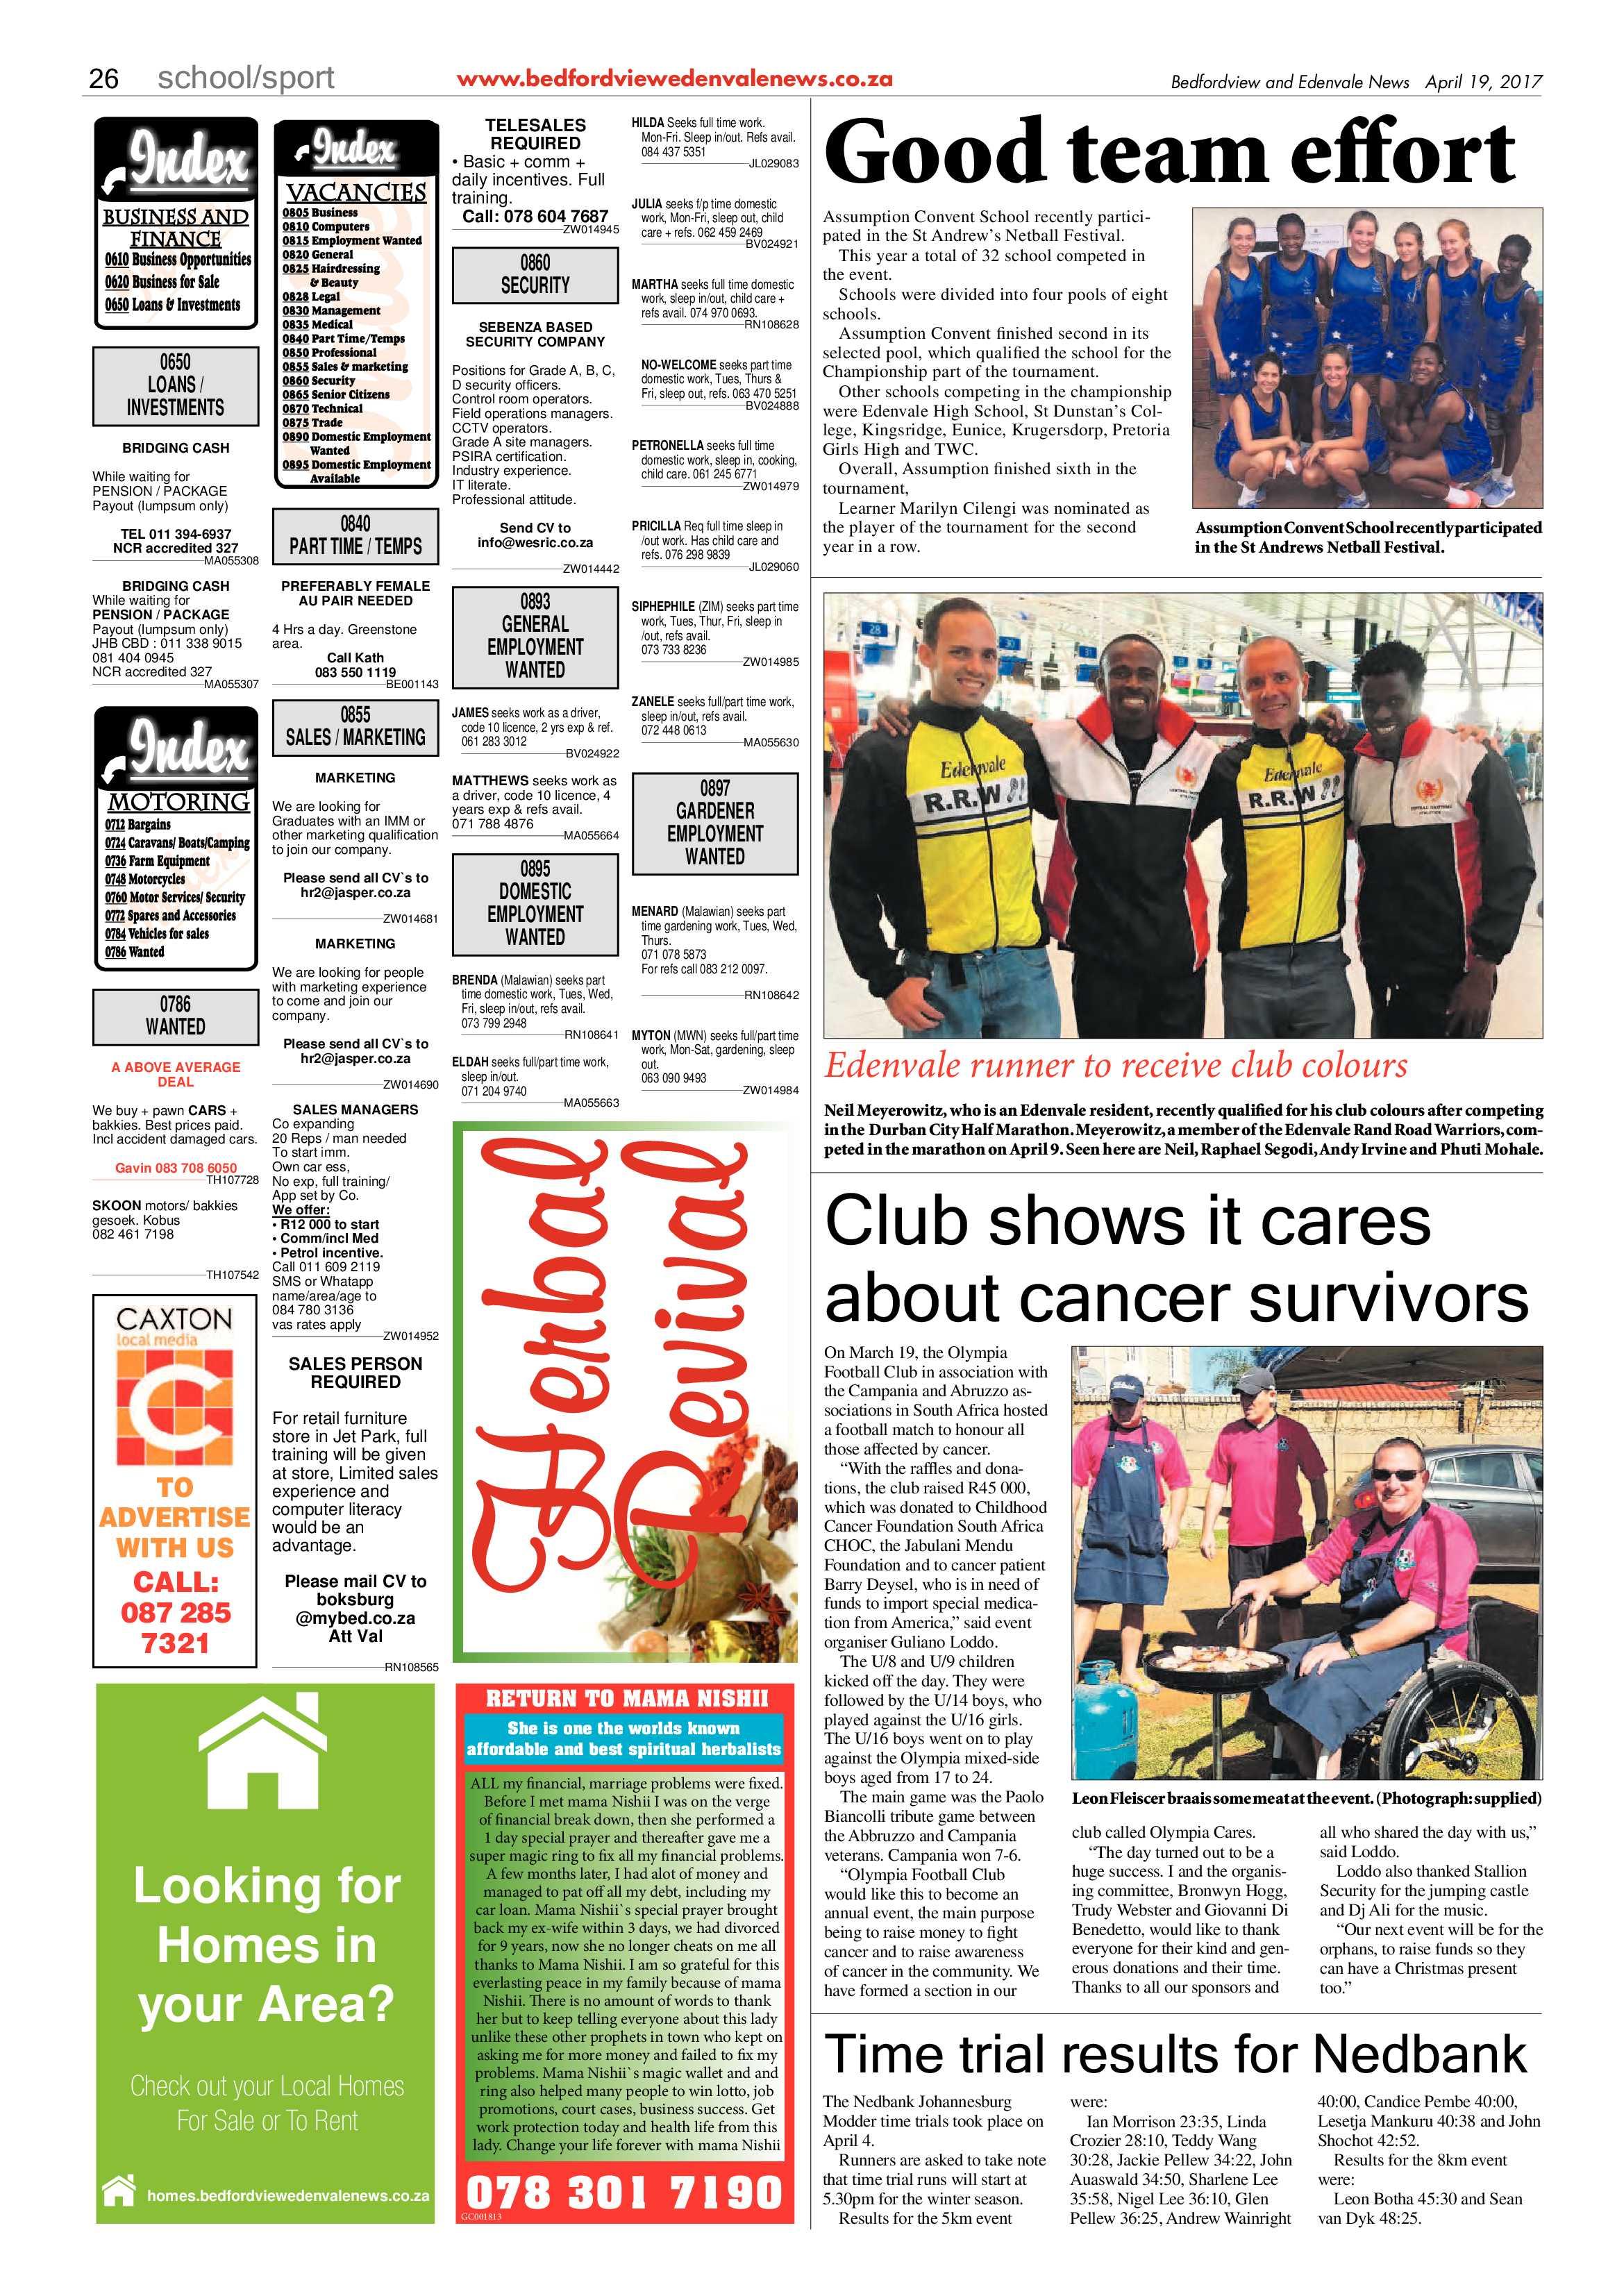 bedfordview-edenvale-news-19-april-2017-epapers-page-26